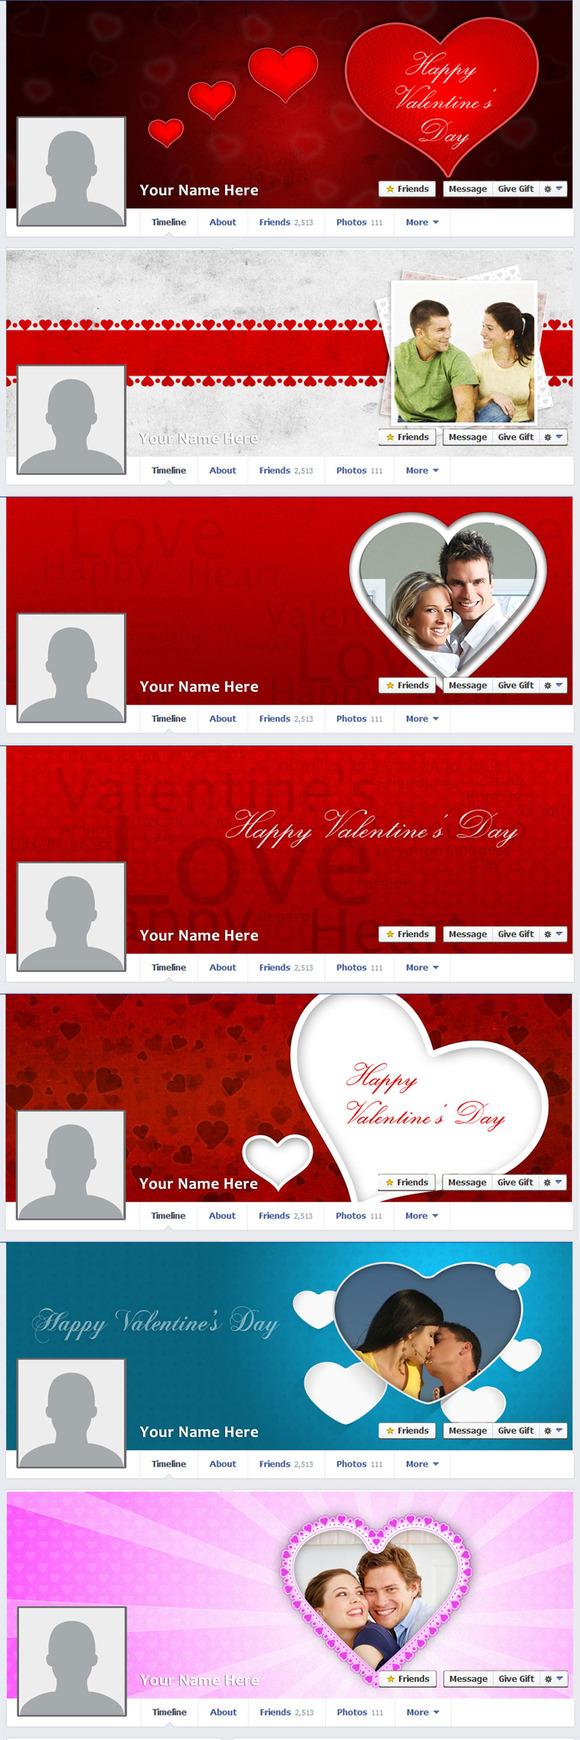 Valentine S Day Facebook Timeline